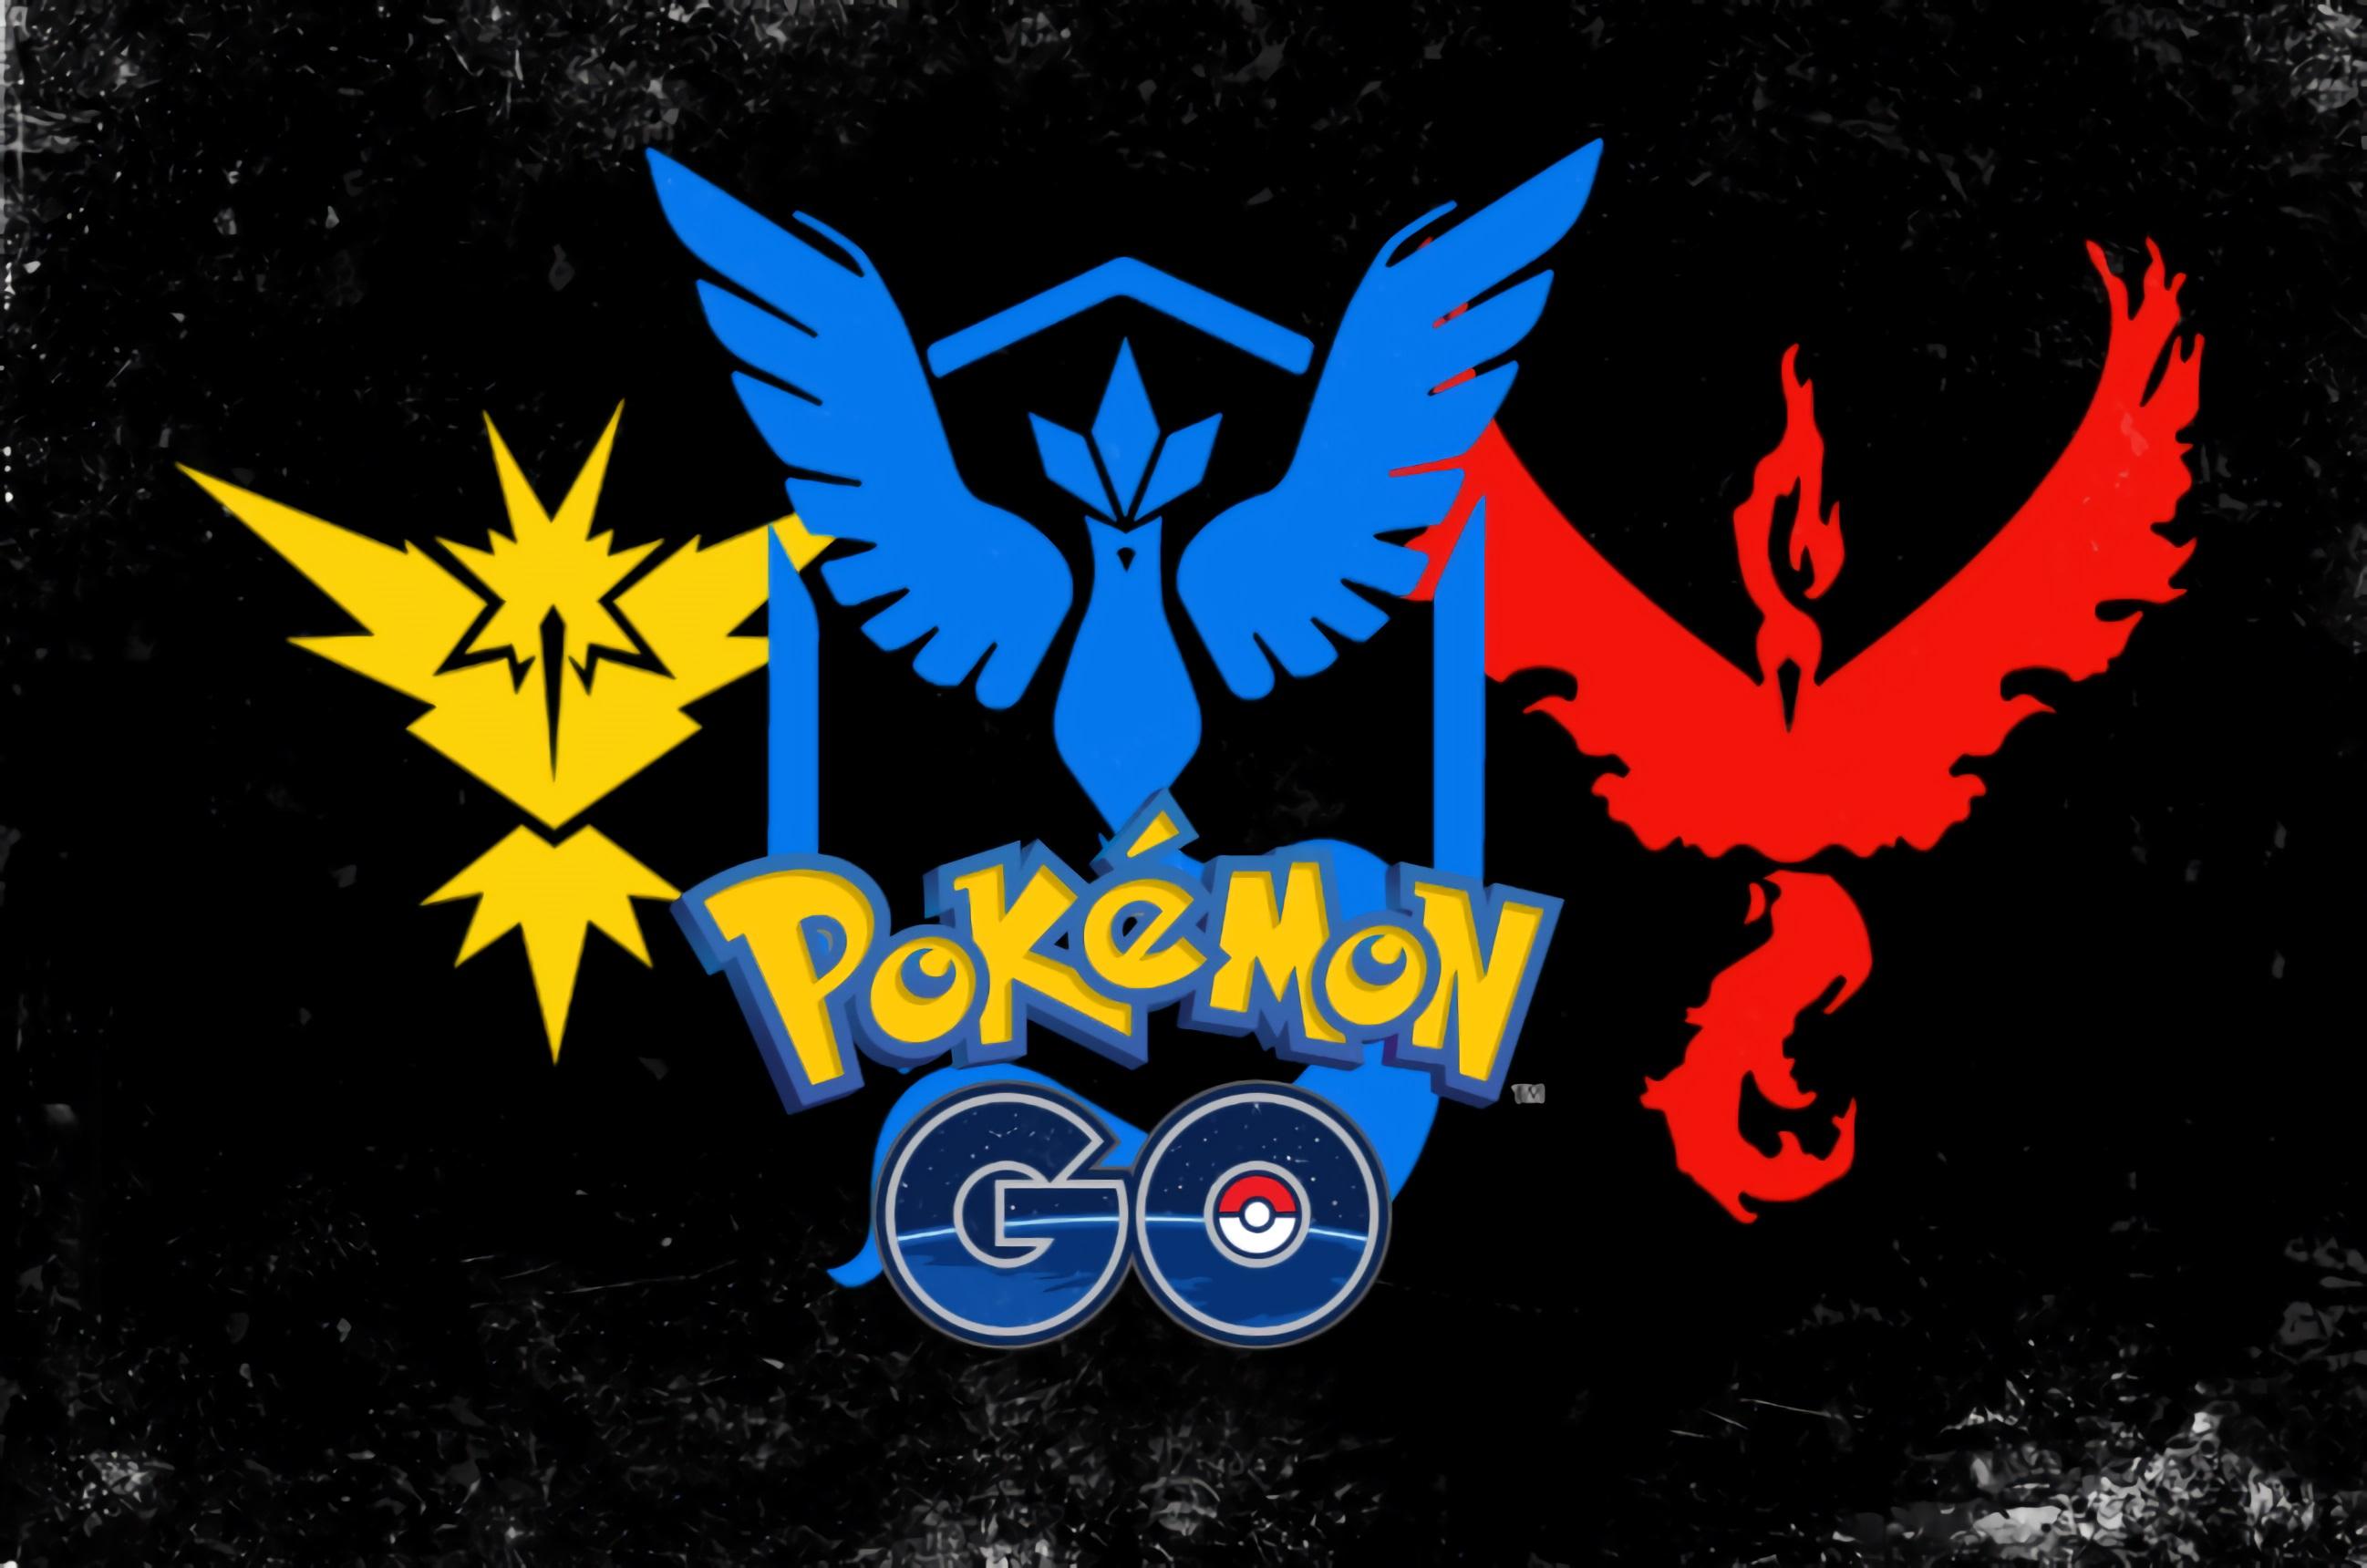 Pokemon GO wallpaper 2